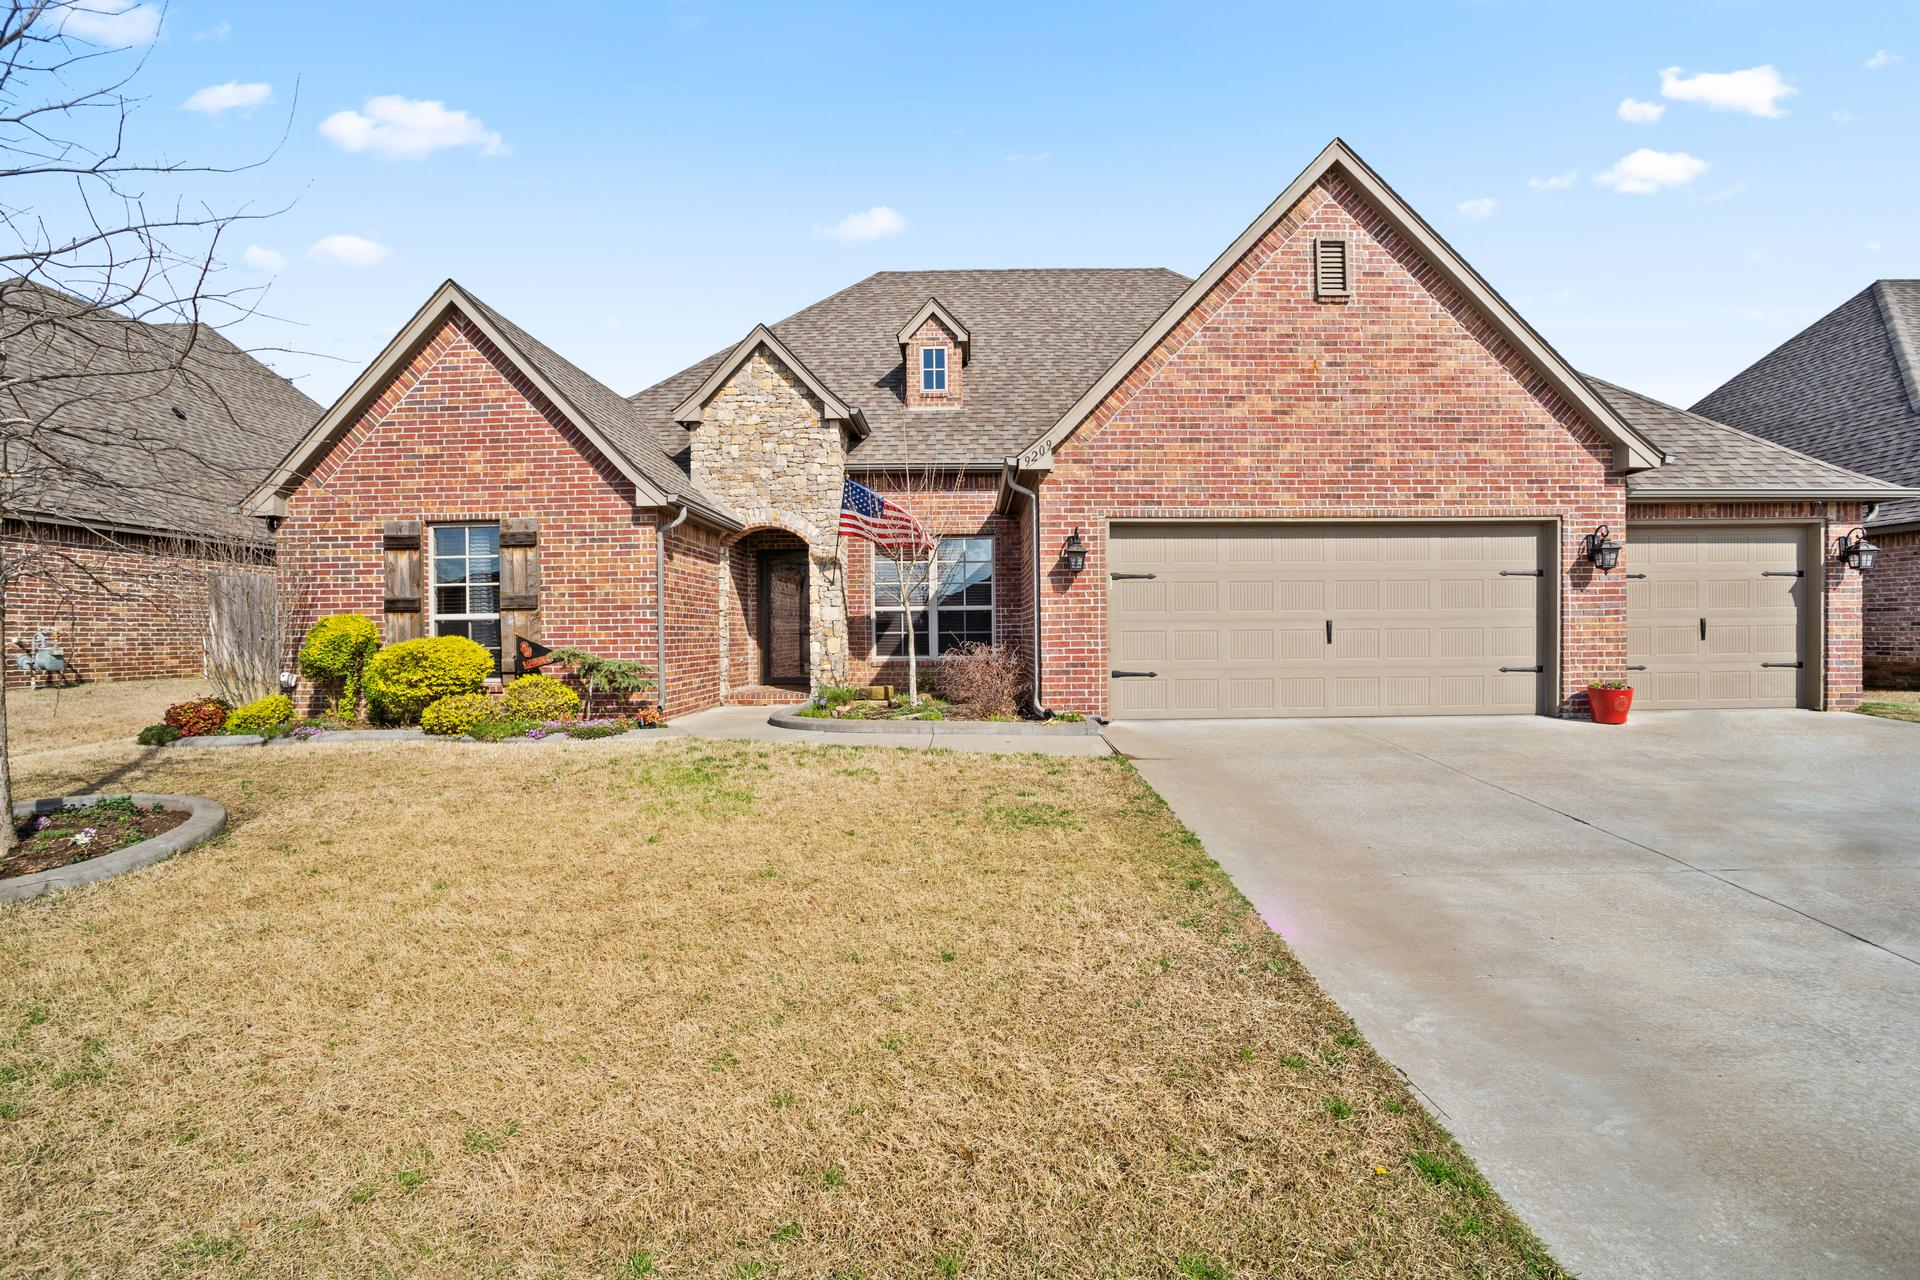 9209 N 96th East Avenue Property Photo